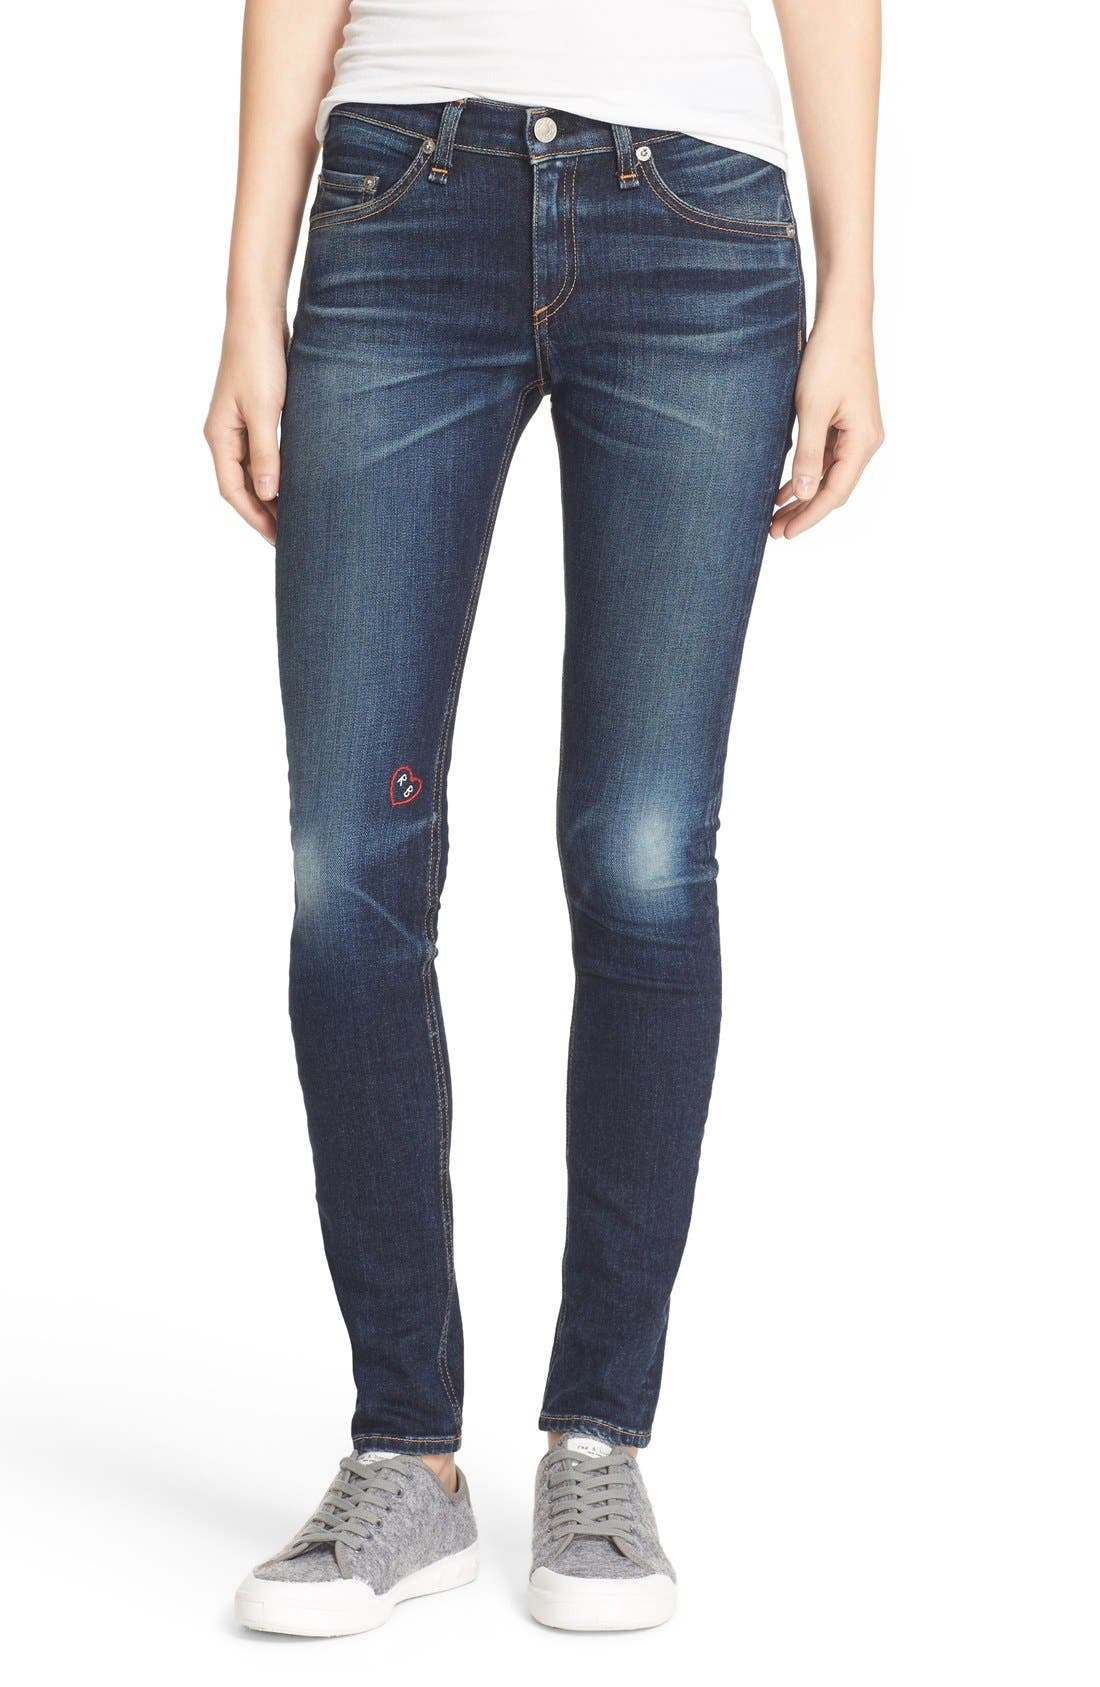 Alternate Image 1 Selected - rag & bone/JEAN Embroidered Skinny Jeans (Baker)